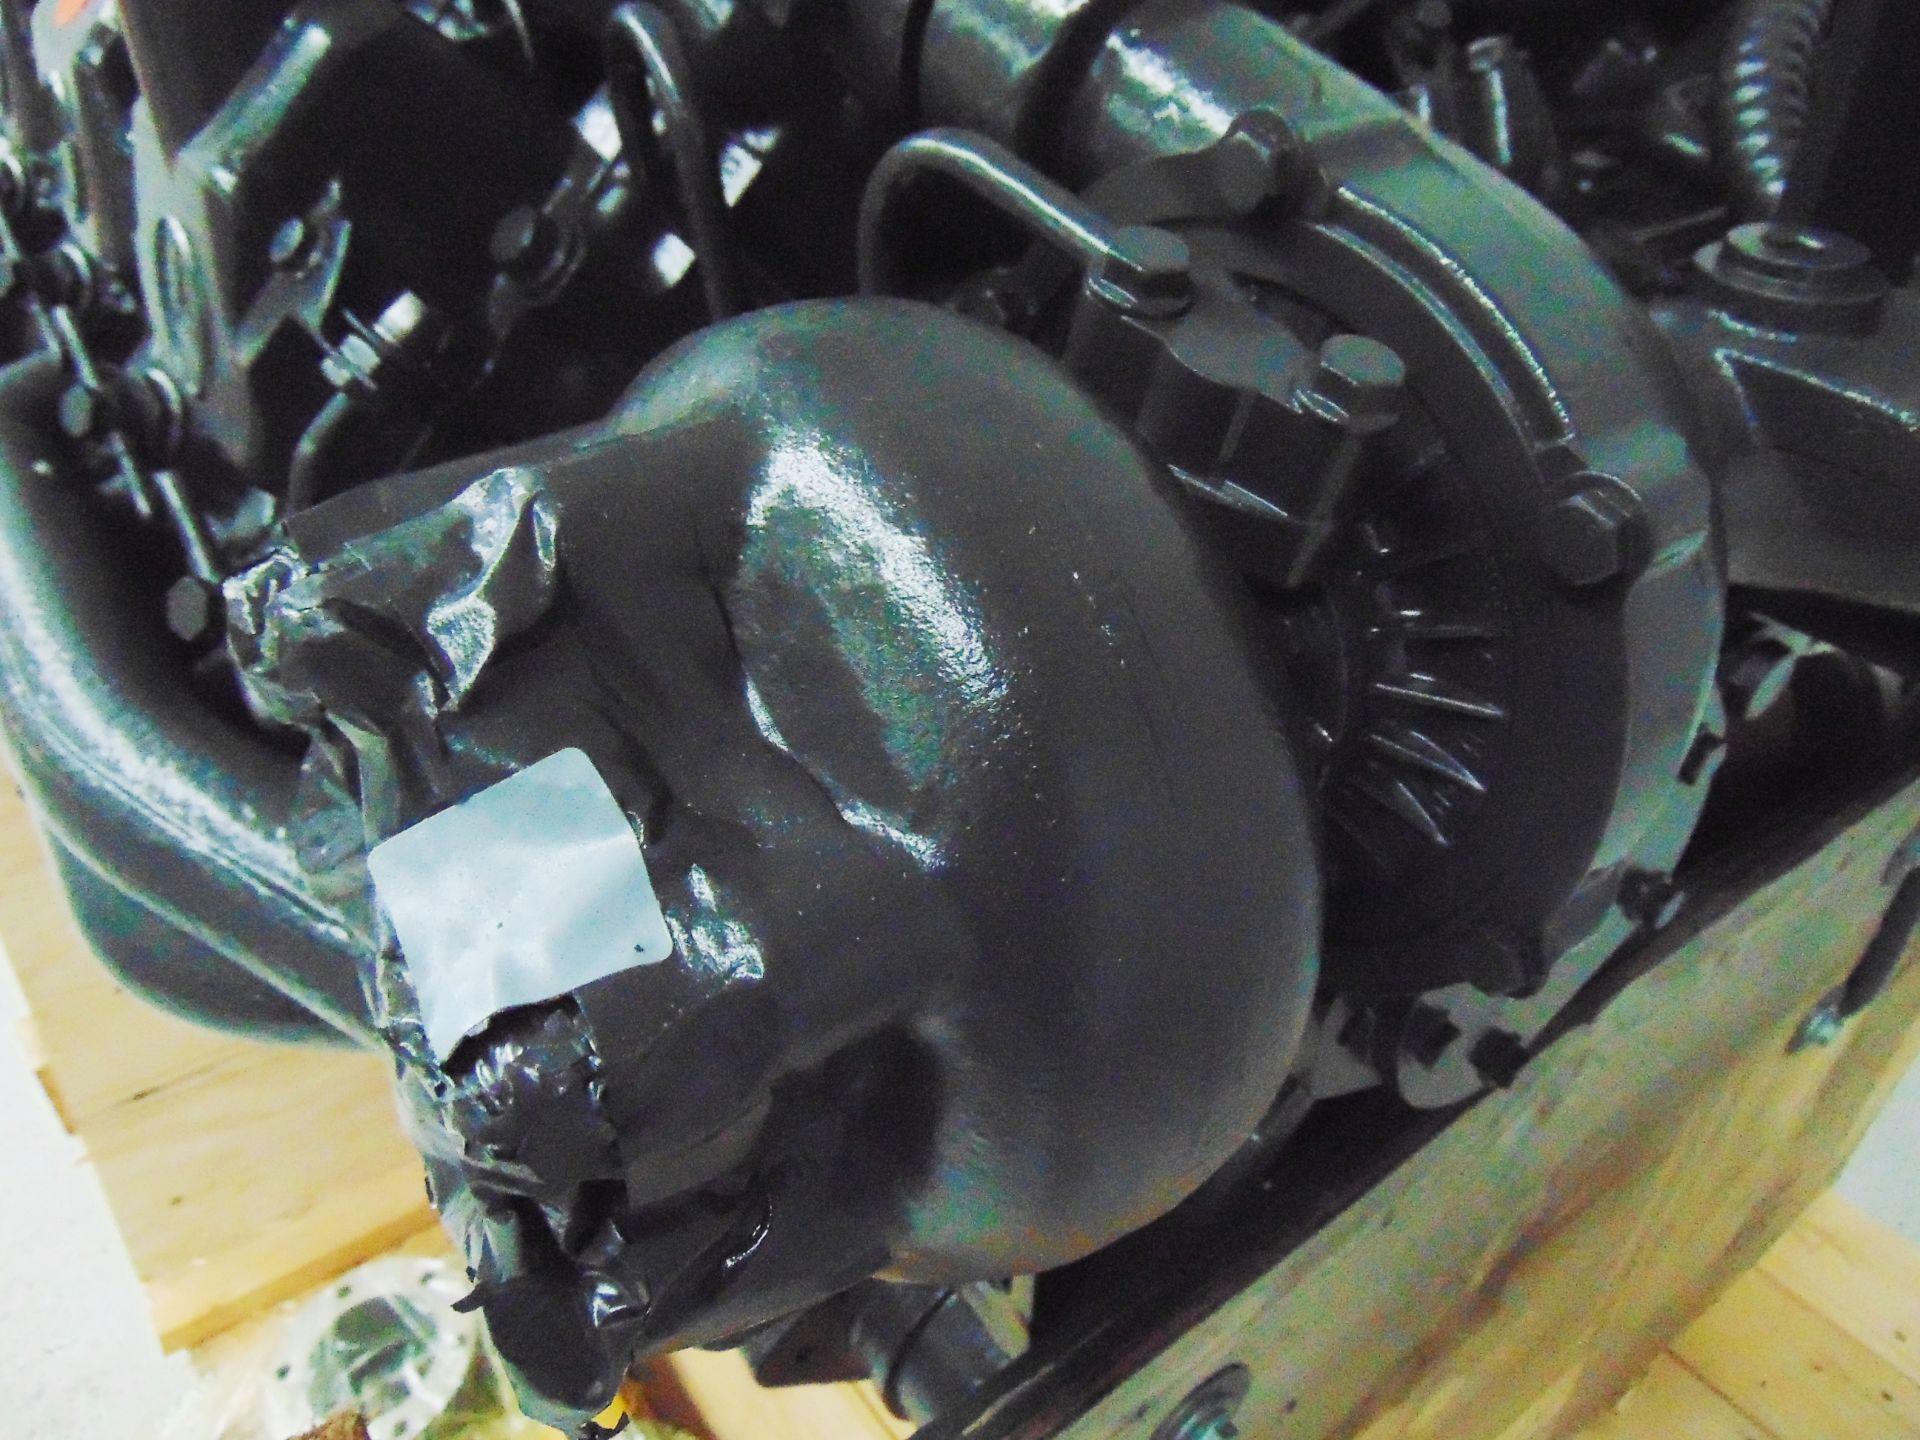 Lot 11 - Brand New & Unused Mercedes-Benz OM402LA V8 Twin Turbo Diesel Engine